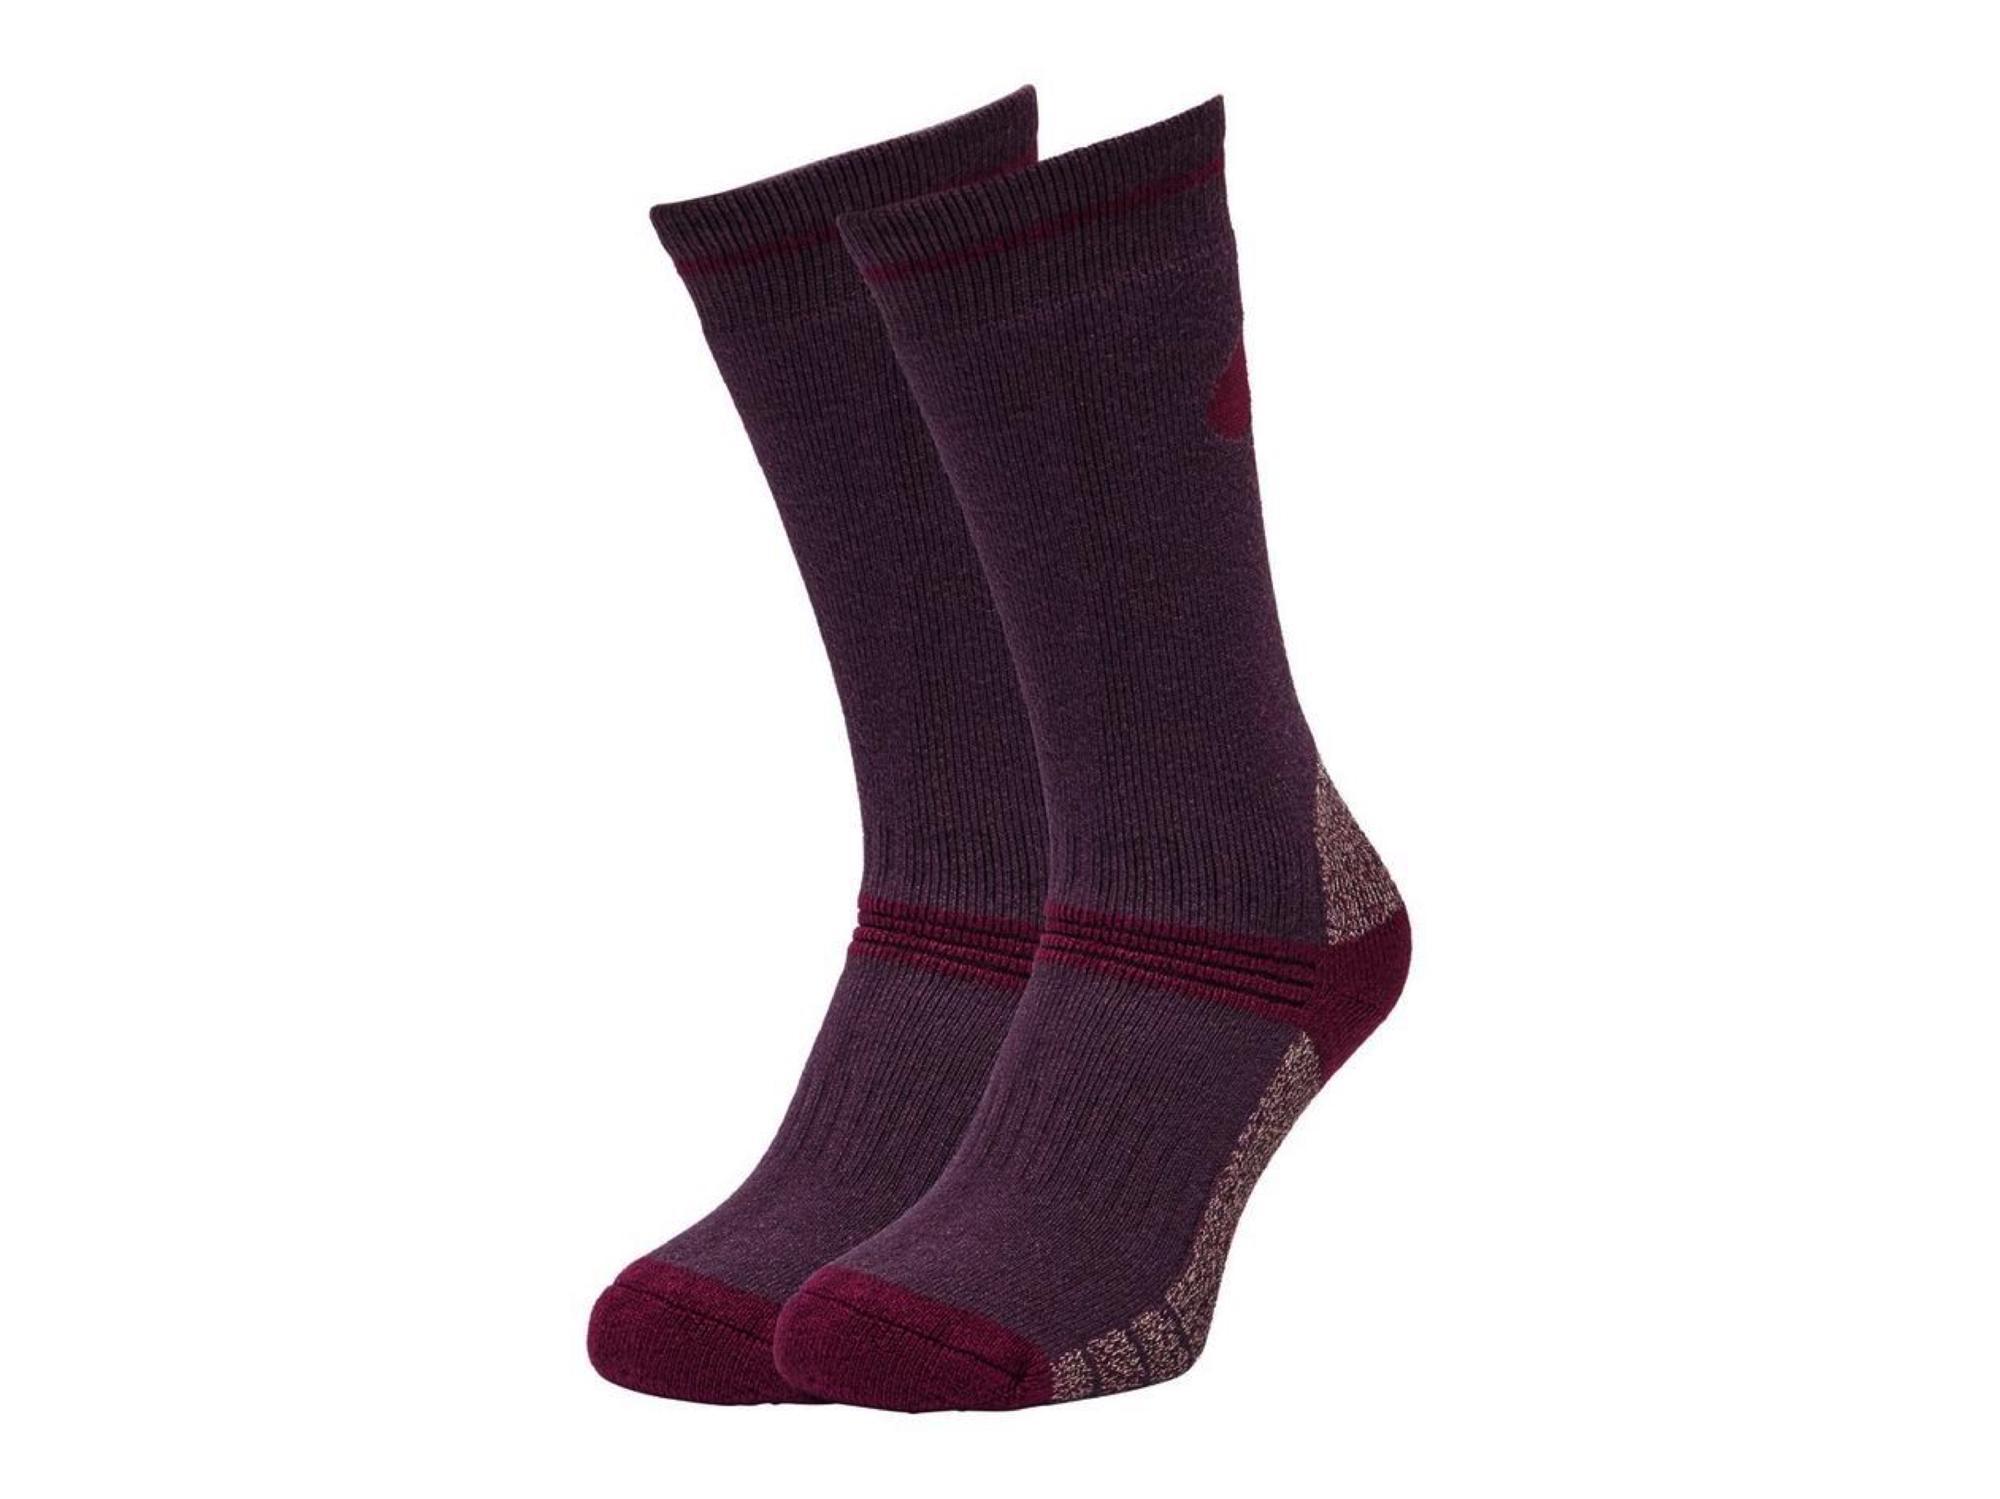 Peter Storm Socks